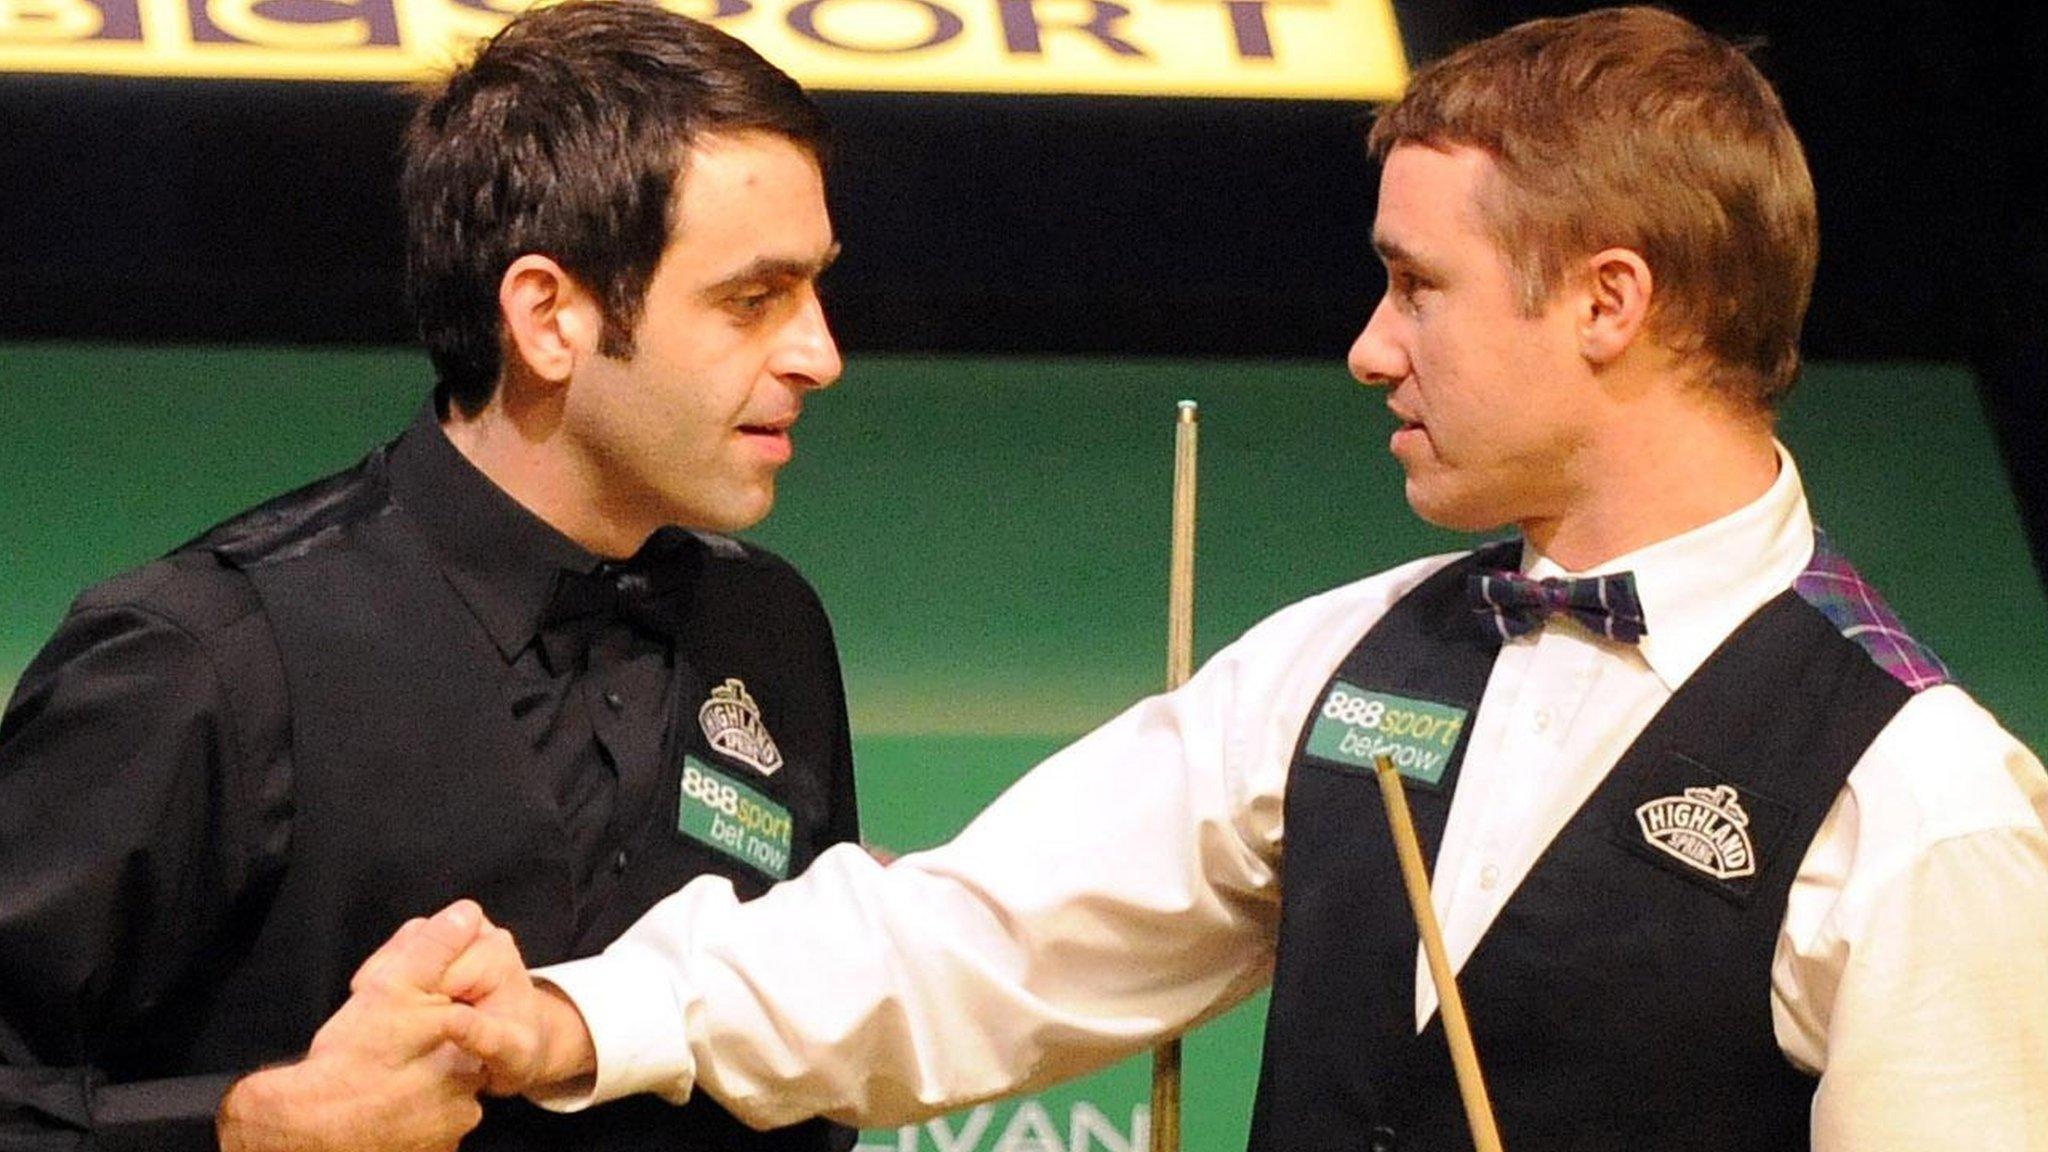 World Championship preview: O'Sullivan avoids Hendry comparisons